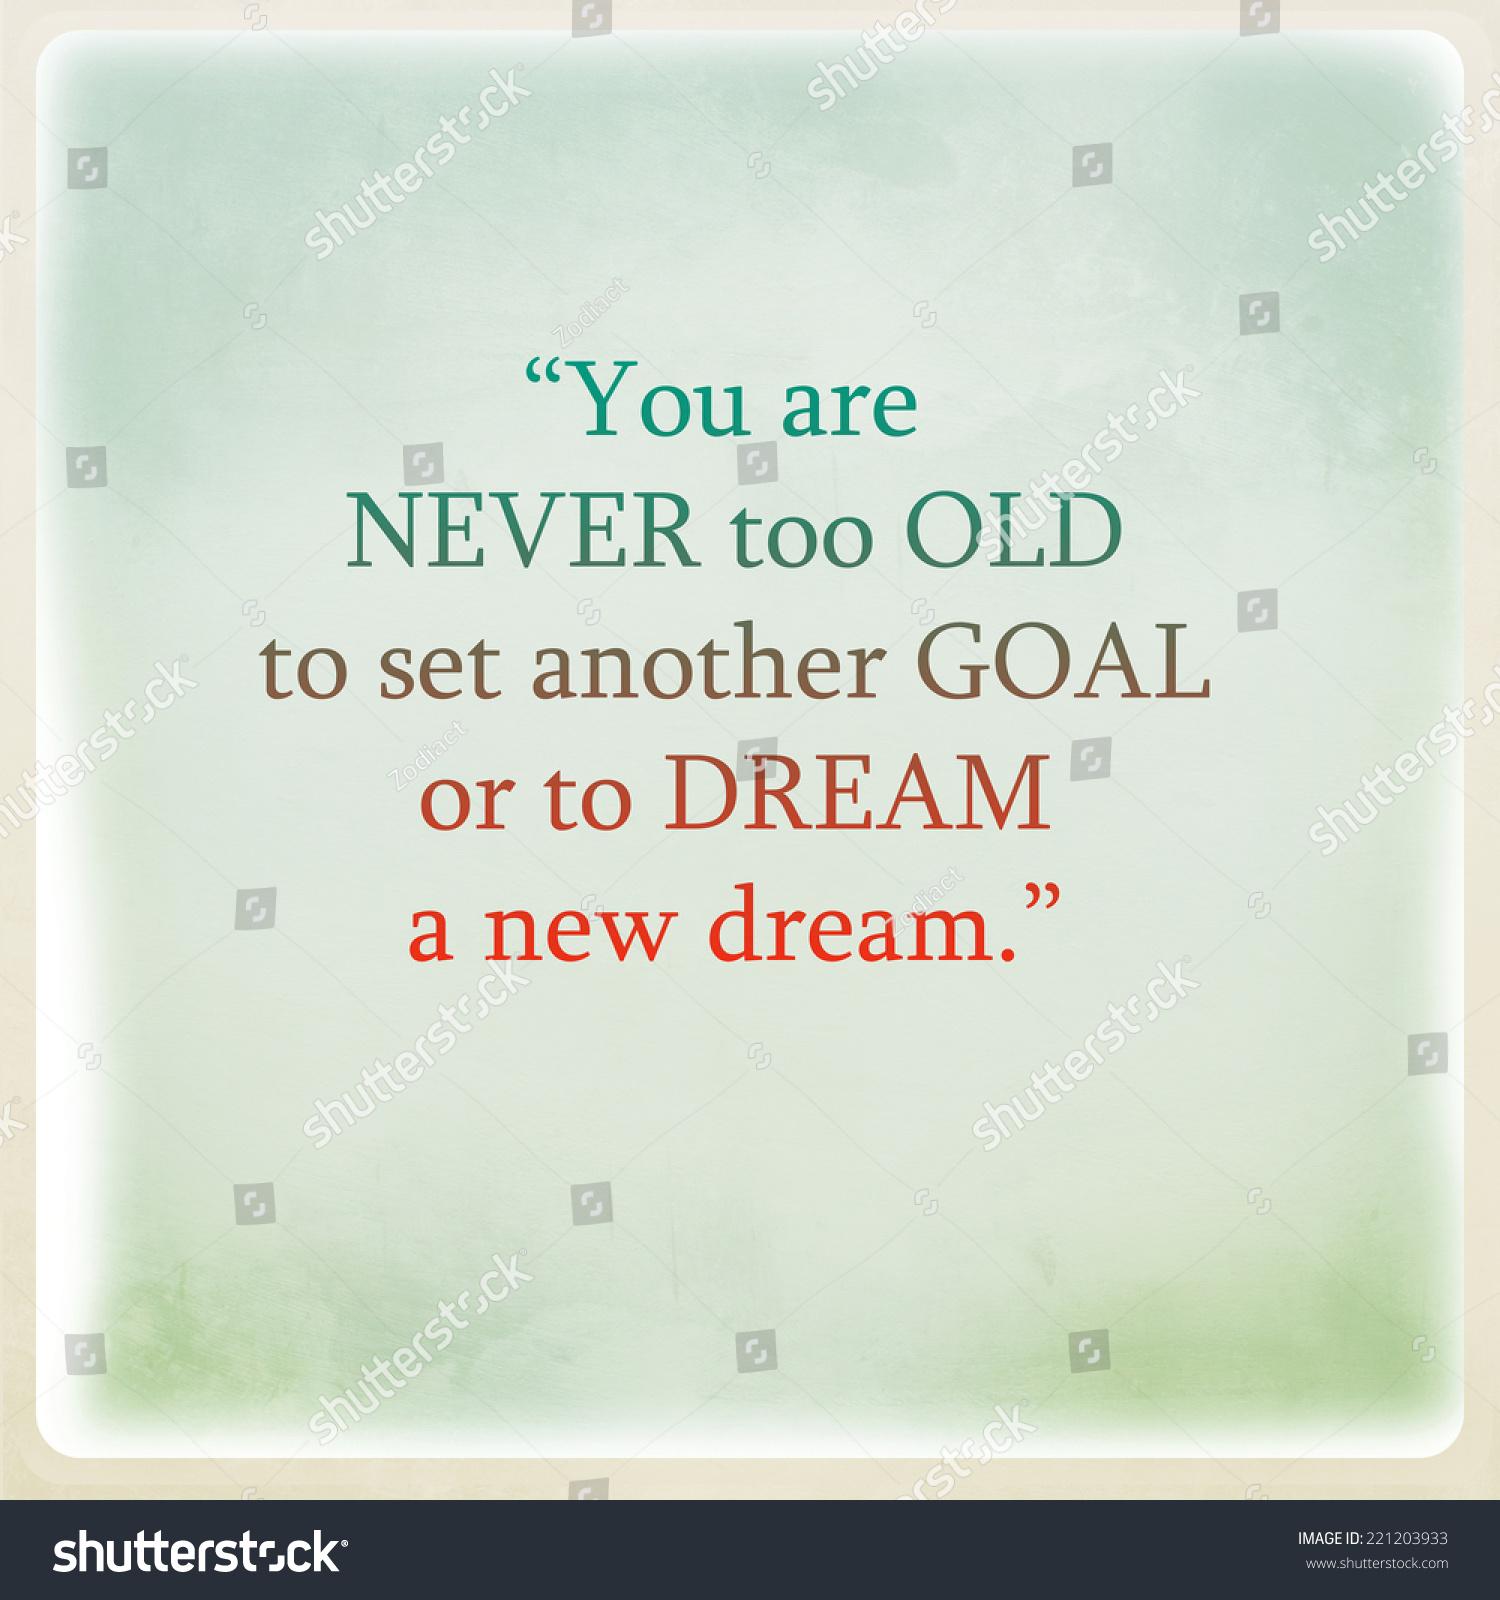 Cs Lewis Quotes On Life Life Quote Inspiration Motivation Quotestock Illustration